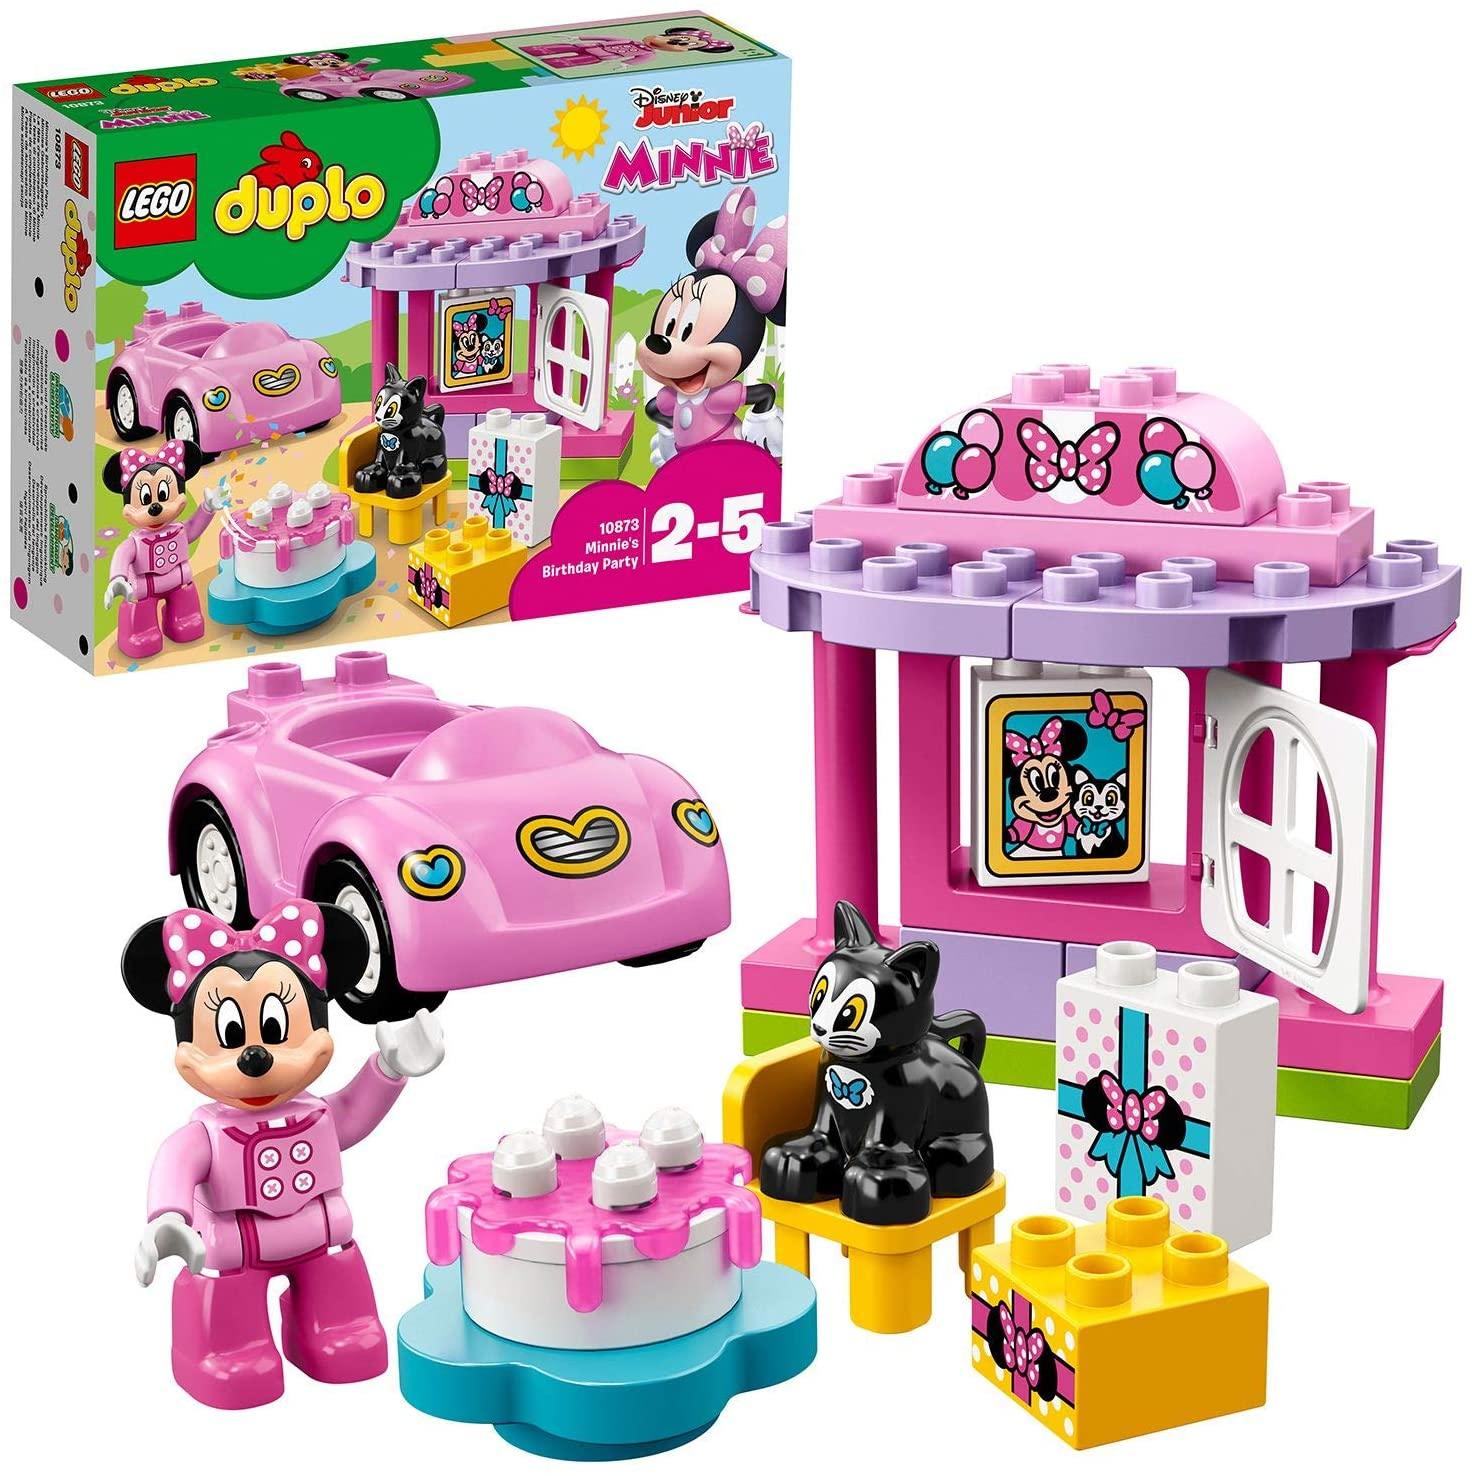 LEGO DUPLO Disney Junior Minnie's Birthday Party LEGO